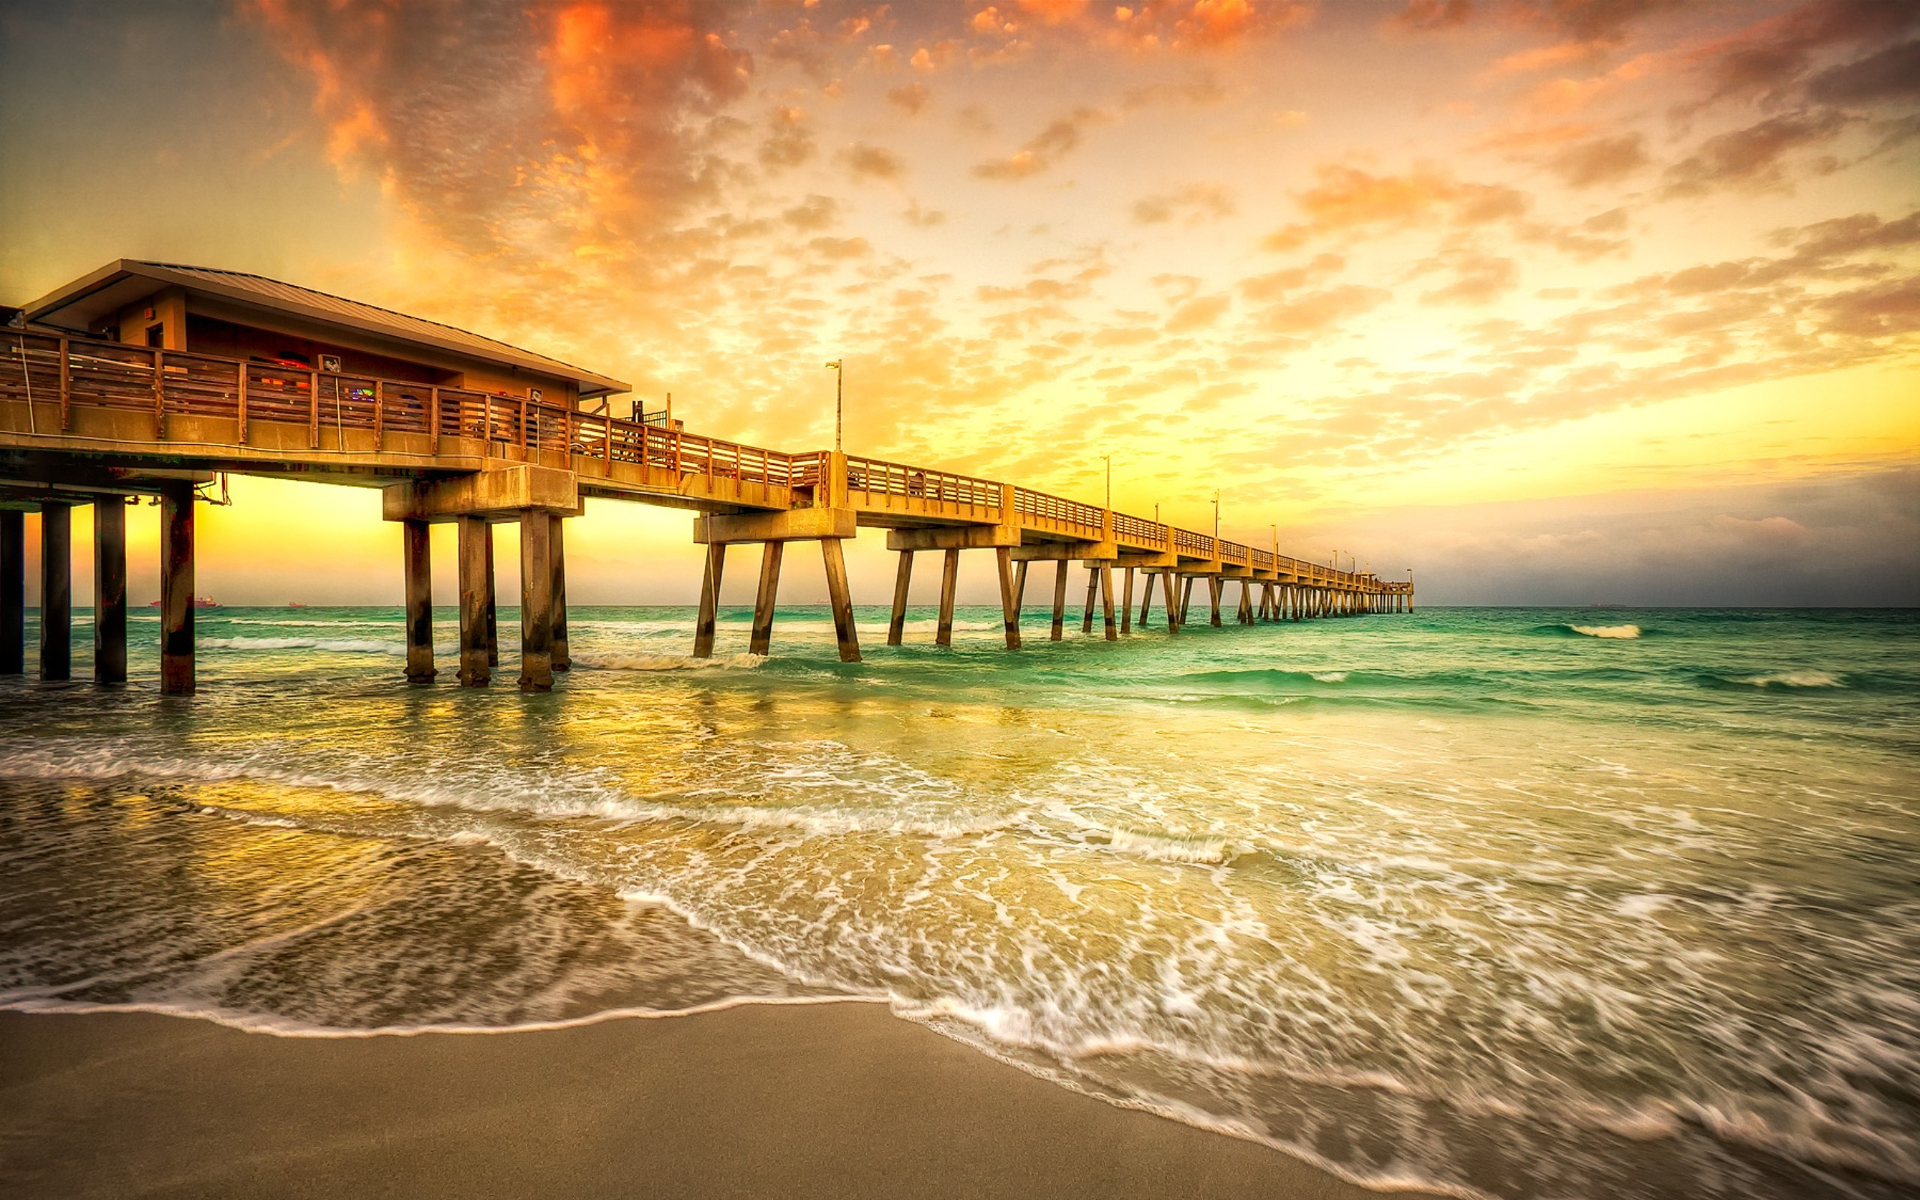 Horizon Man Made Ocean Pier Sky Sunset Orange Color 1920x1200